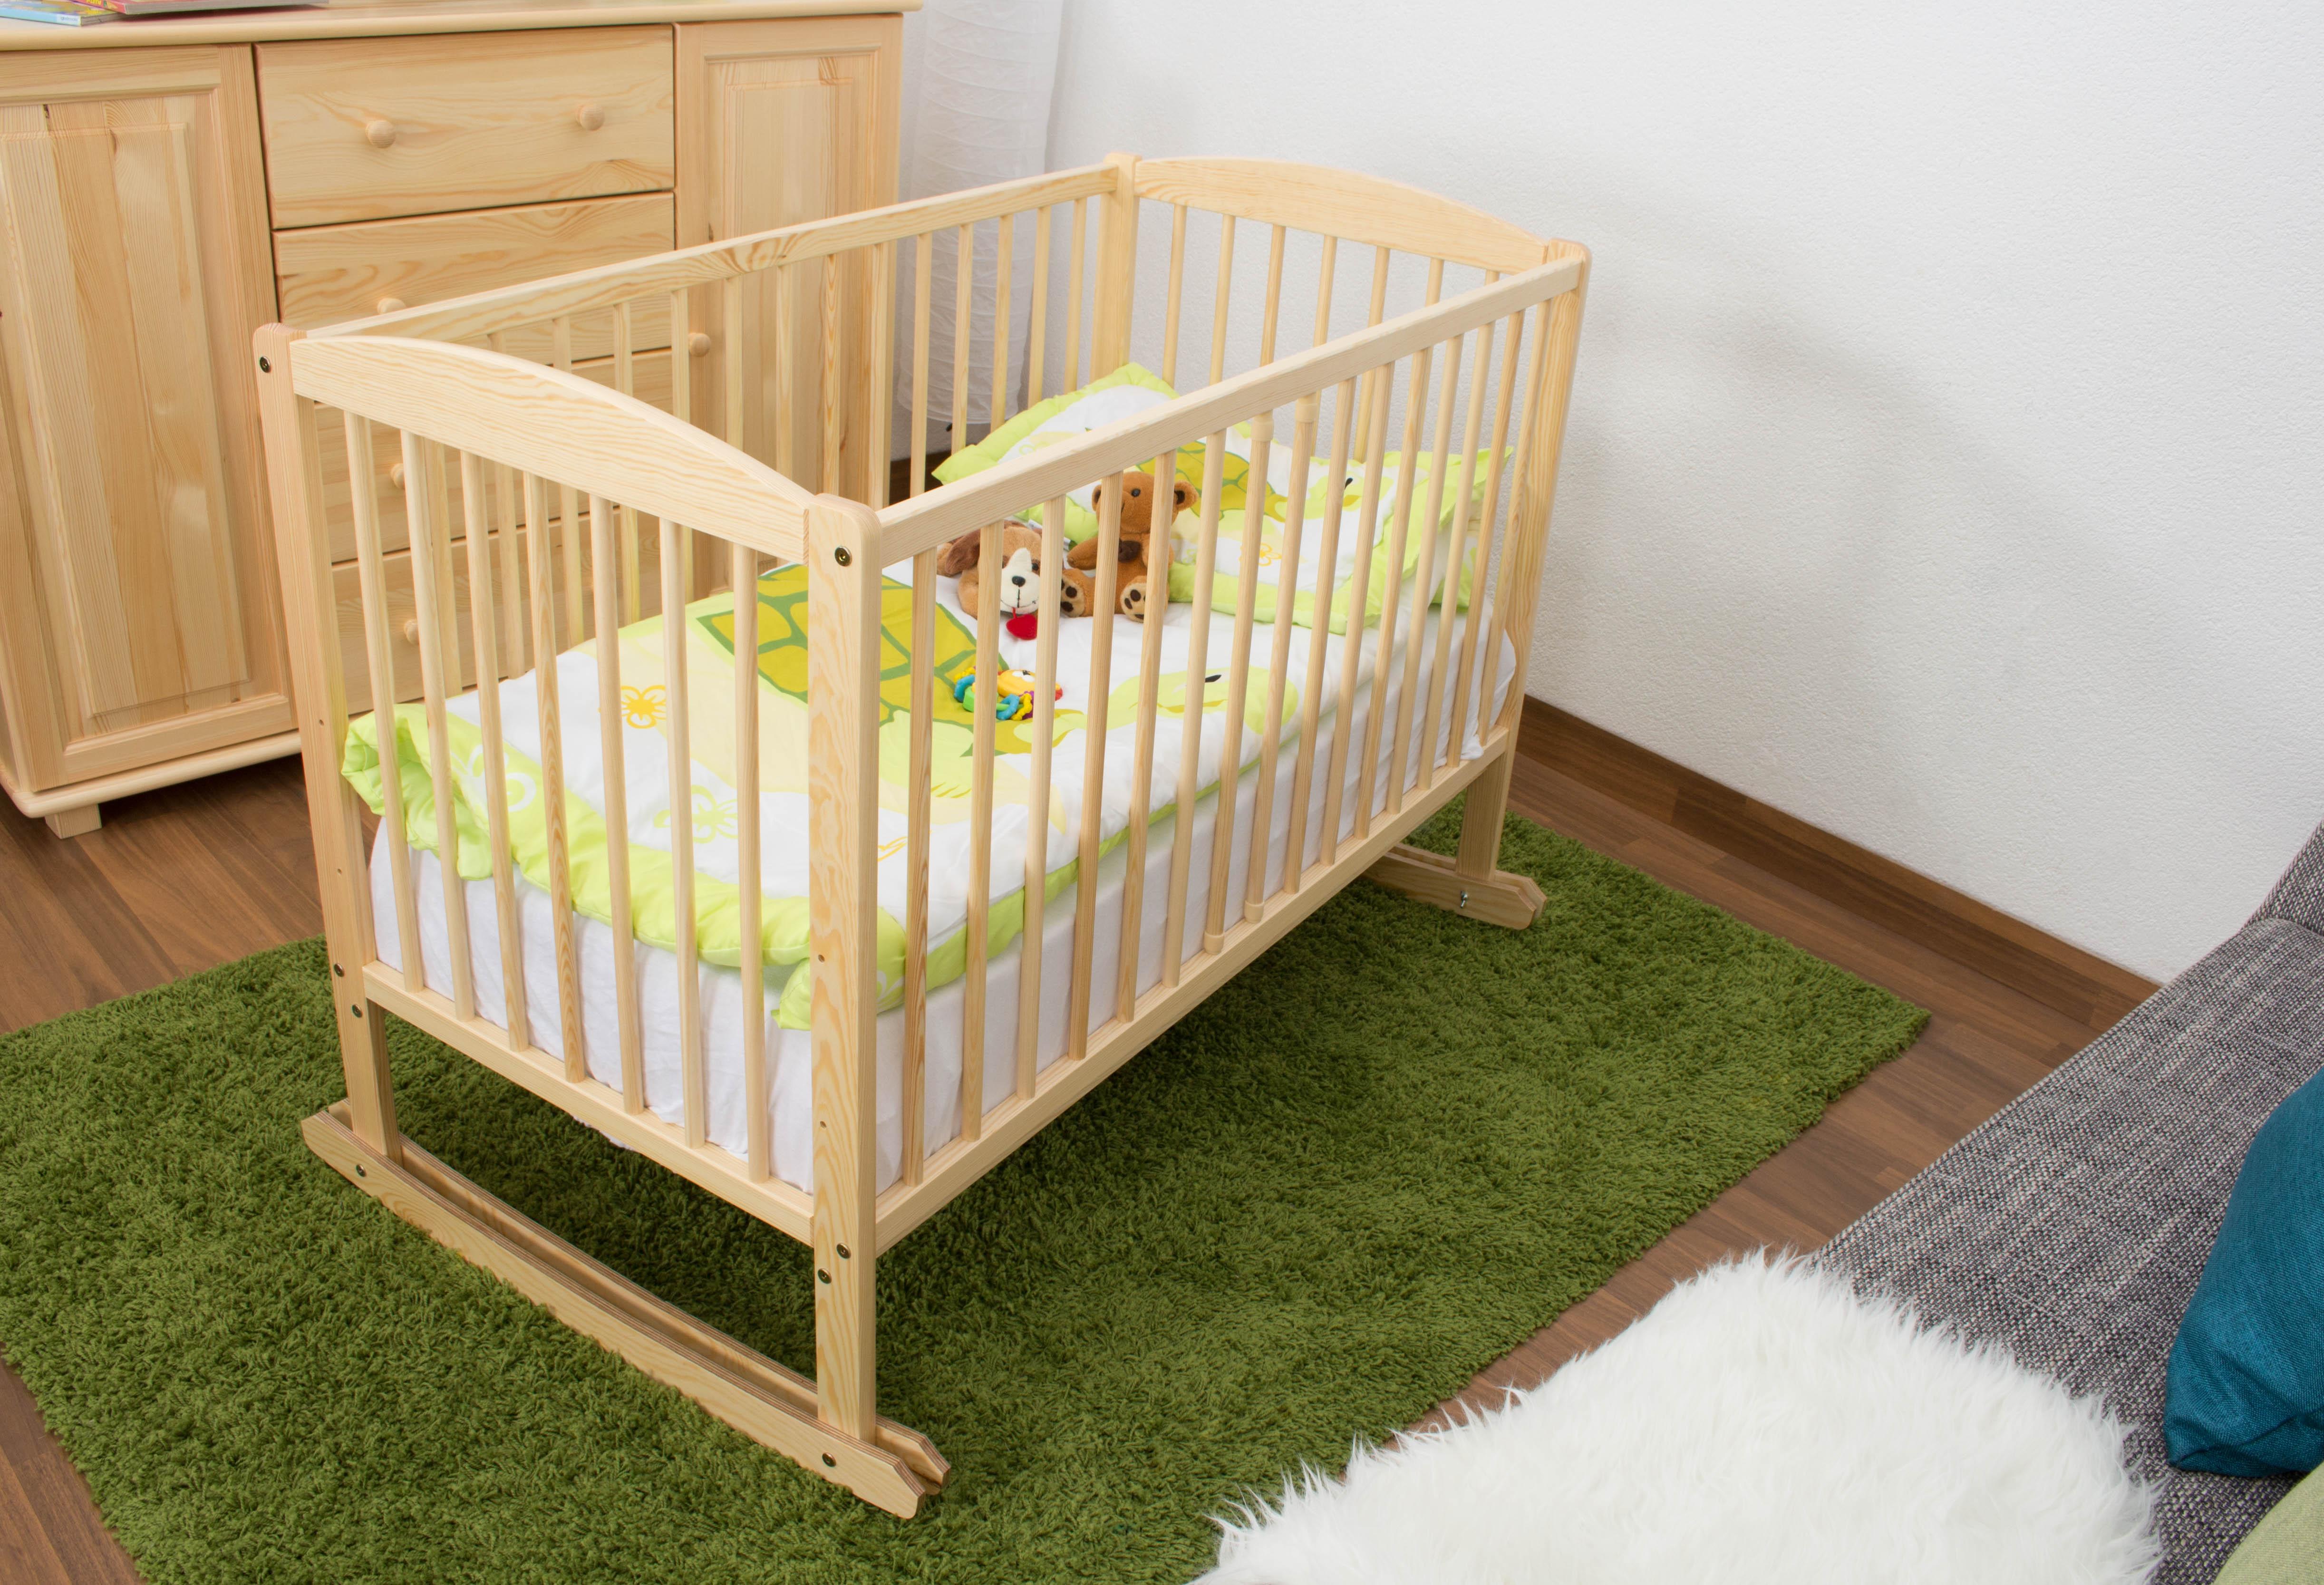 Steiner Shopping Möbel Babywiege Kiefer massiv Vollholz natur 104, inkl. Lattenrost - Abmessung 60 x 120 cm